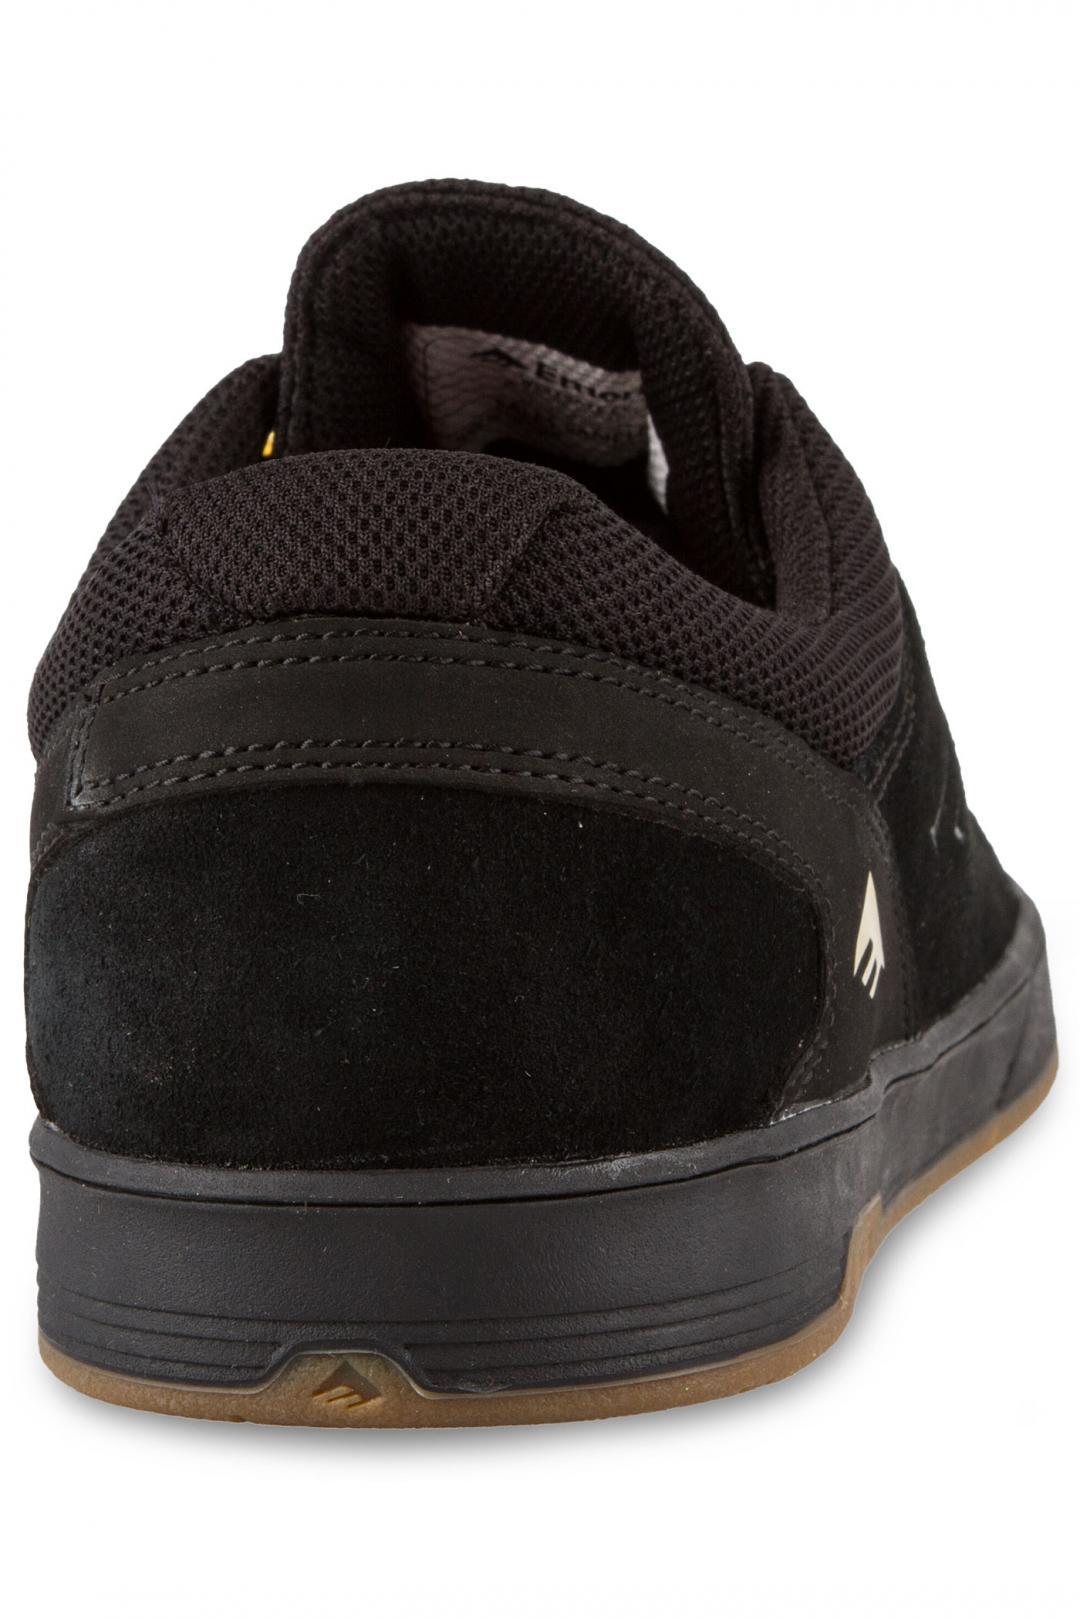 Uomo Emerica The Westgate CC Suede black black gum | Sneakers low top